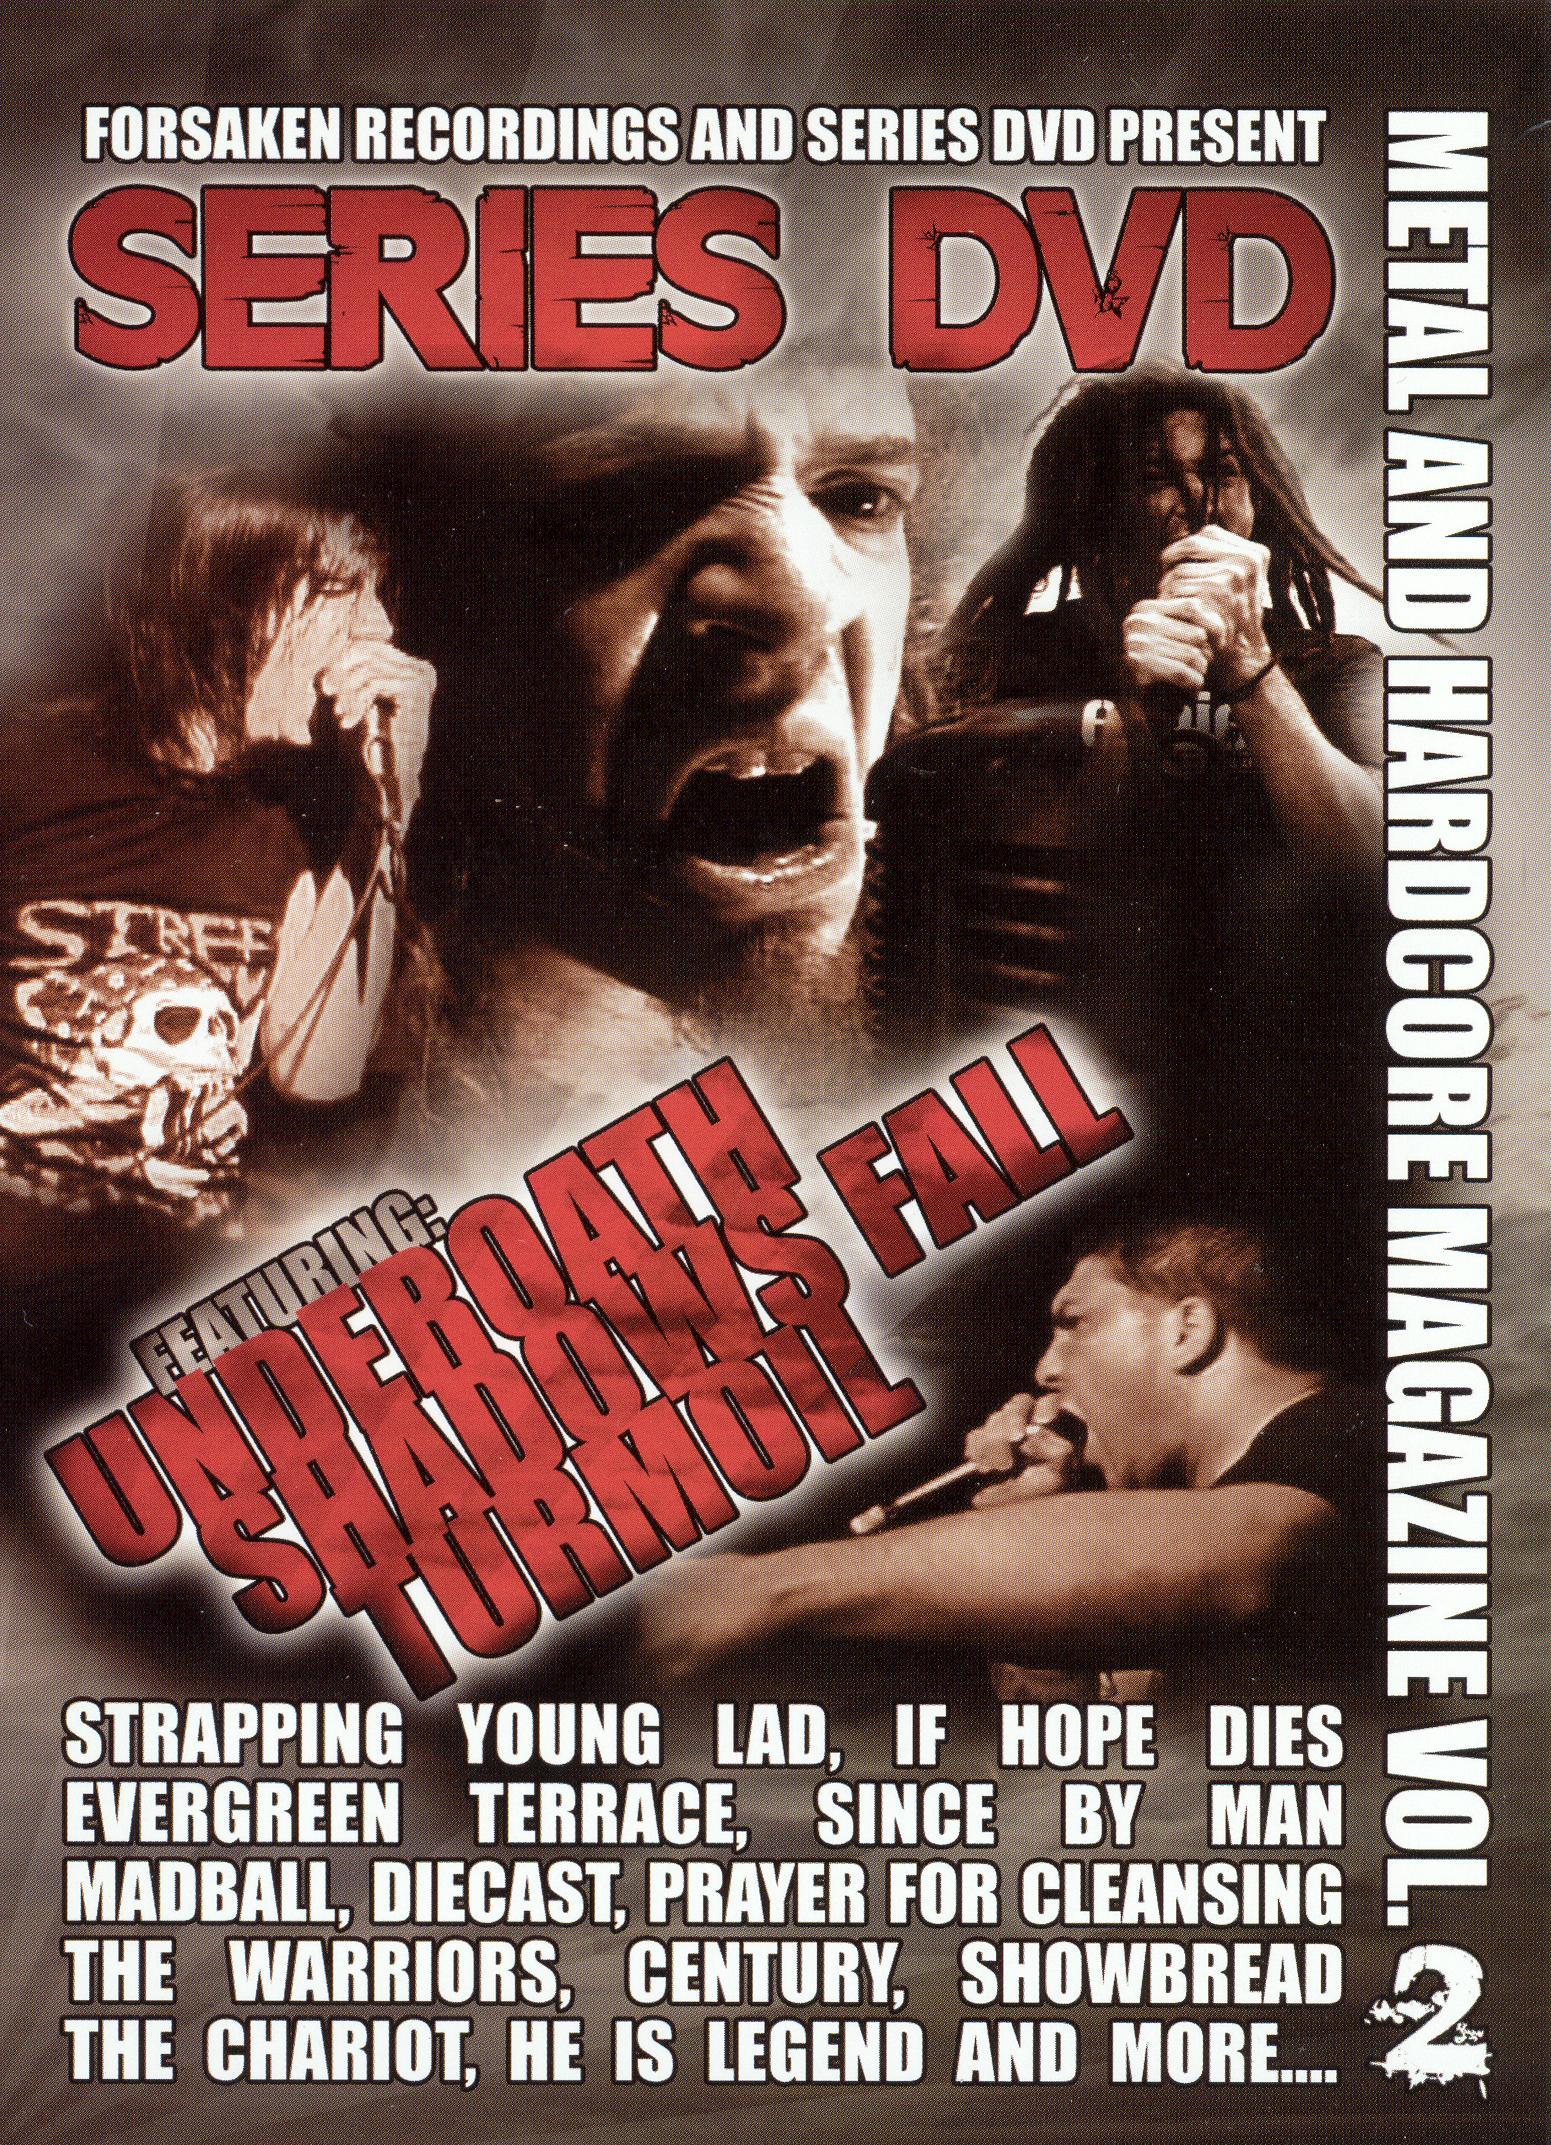 Series DVD: Metal and Hardcore, Vol. 2